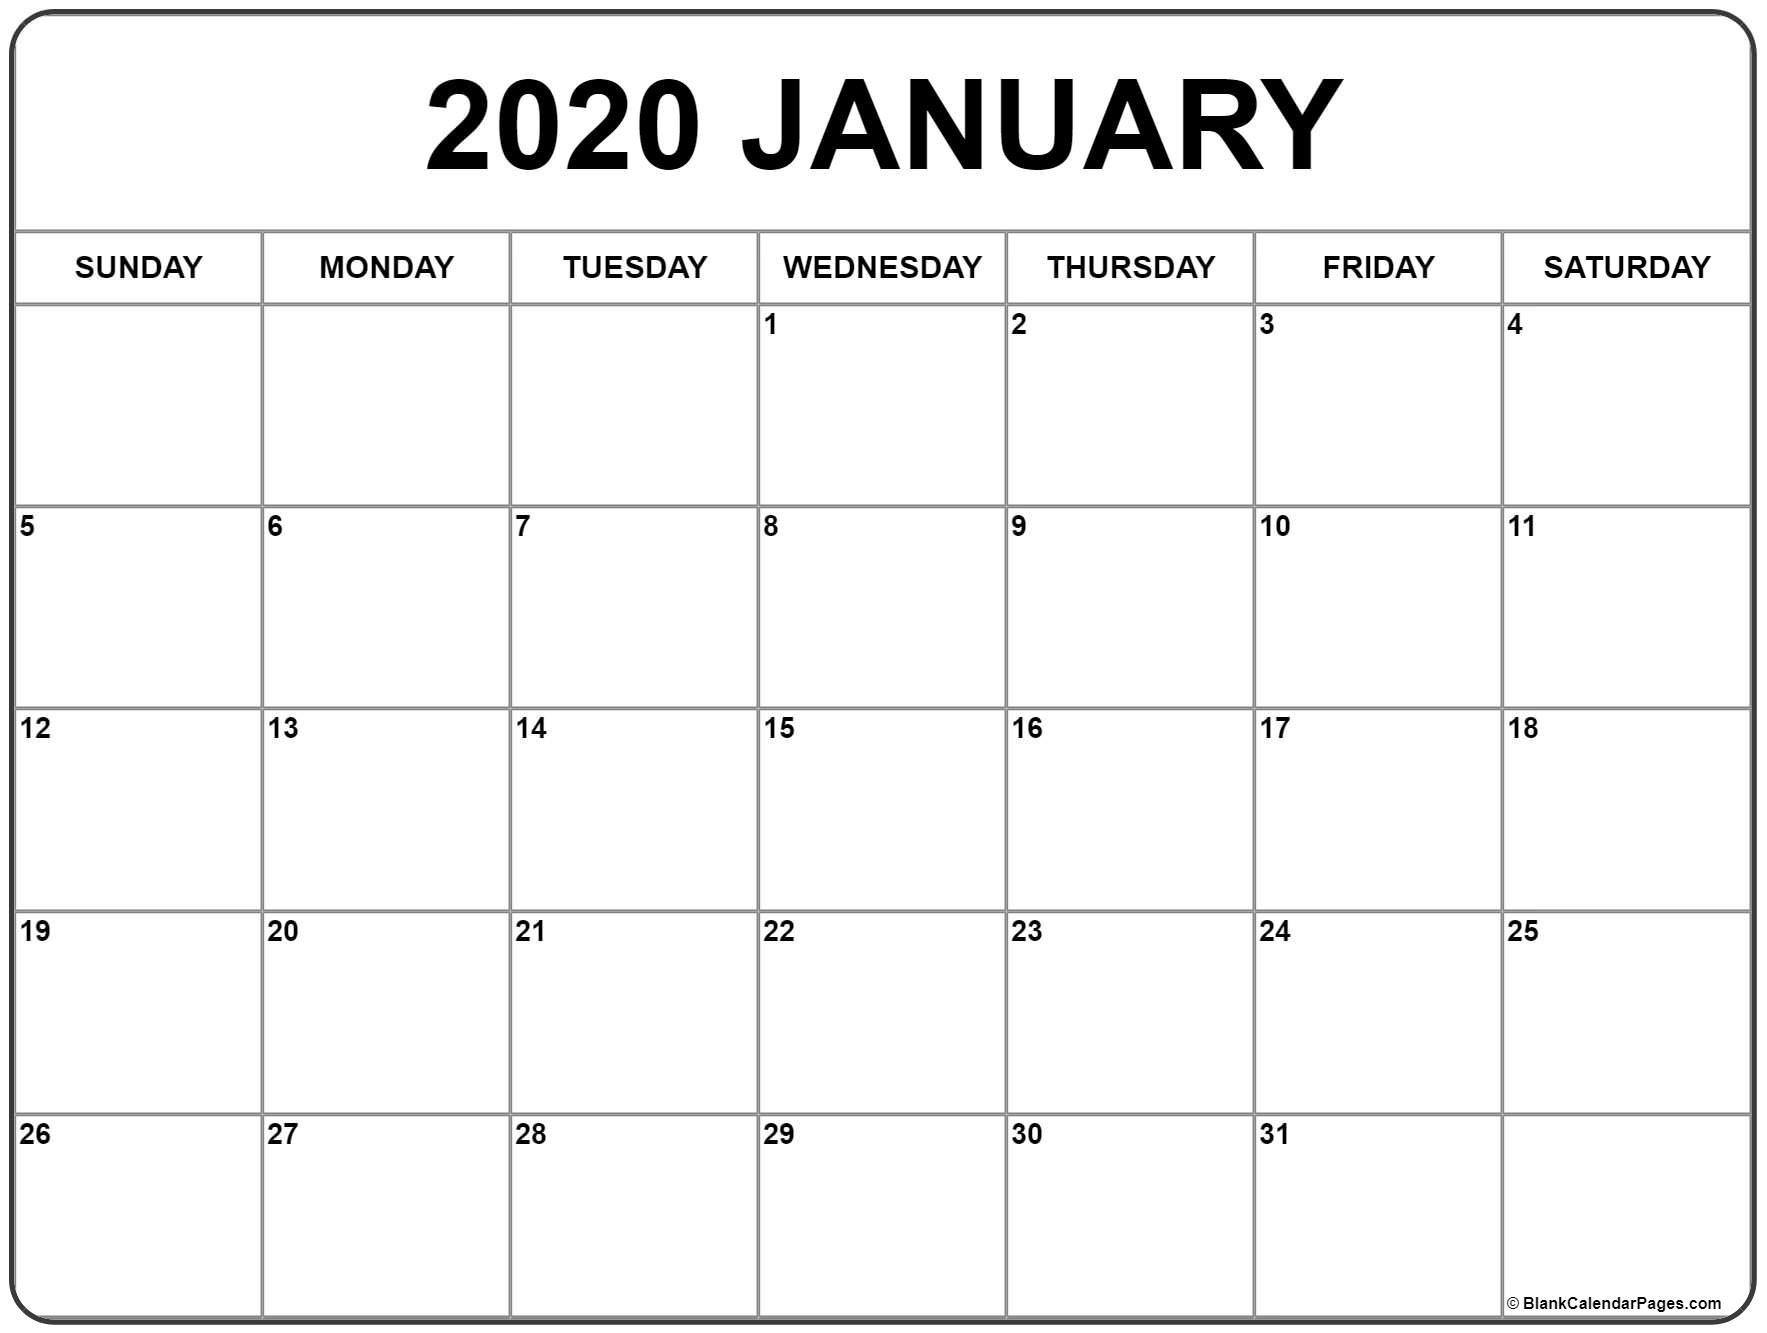 January 2020 Calendar   Free Printable Monthly Calendars-January 2020 Calendar Page